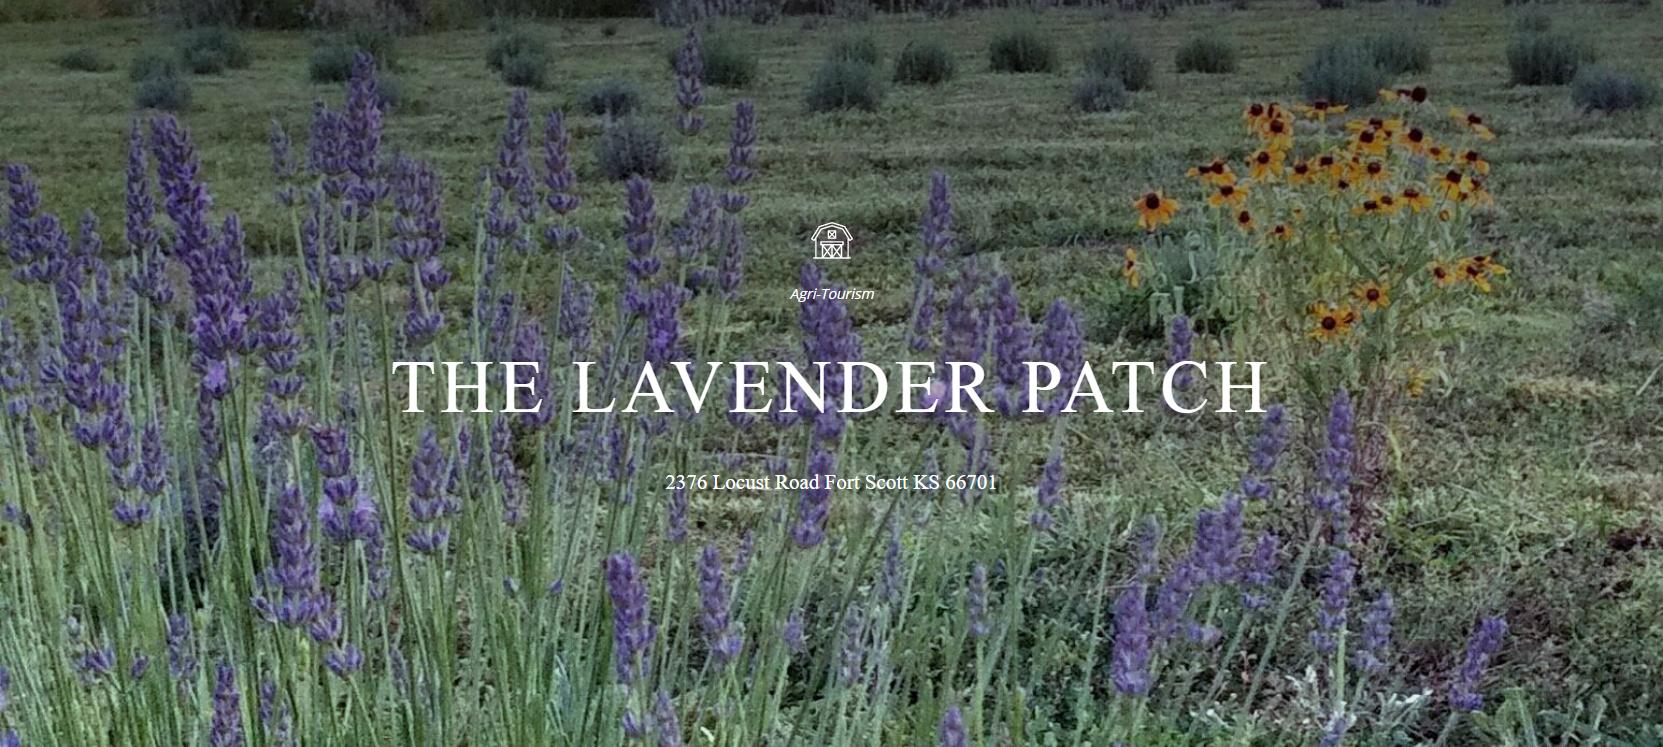 thelavenderpatchfarm